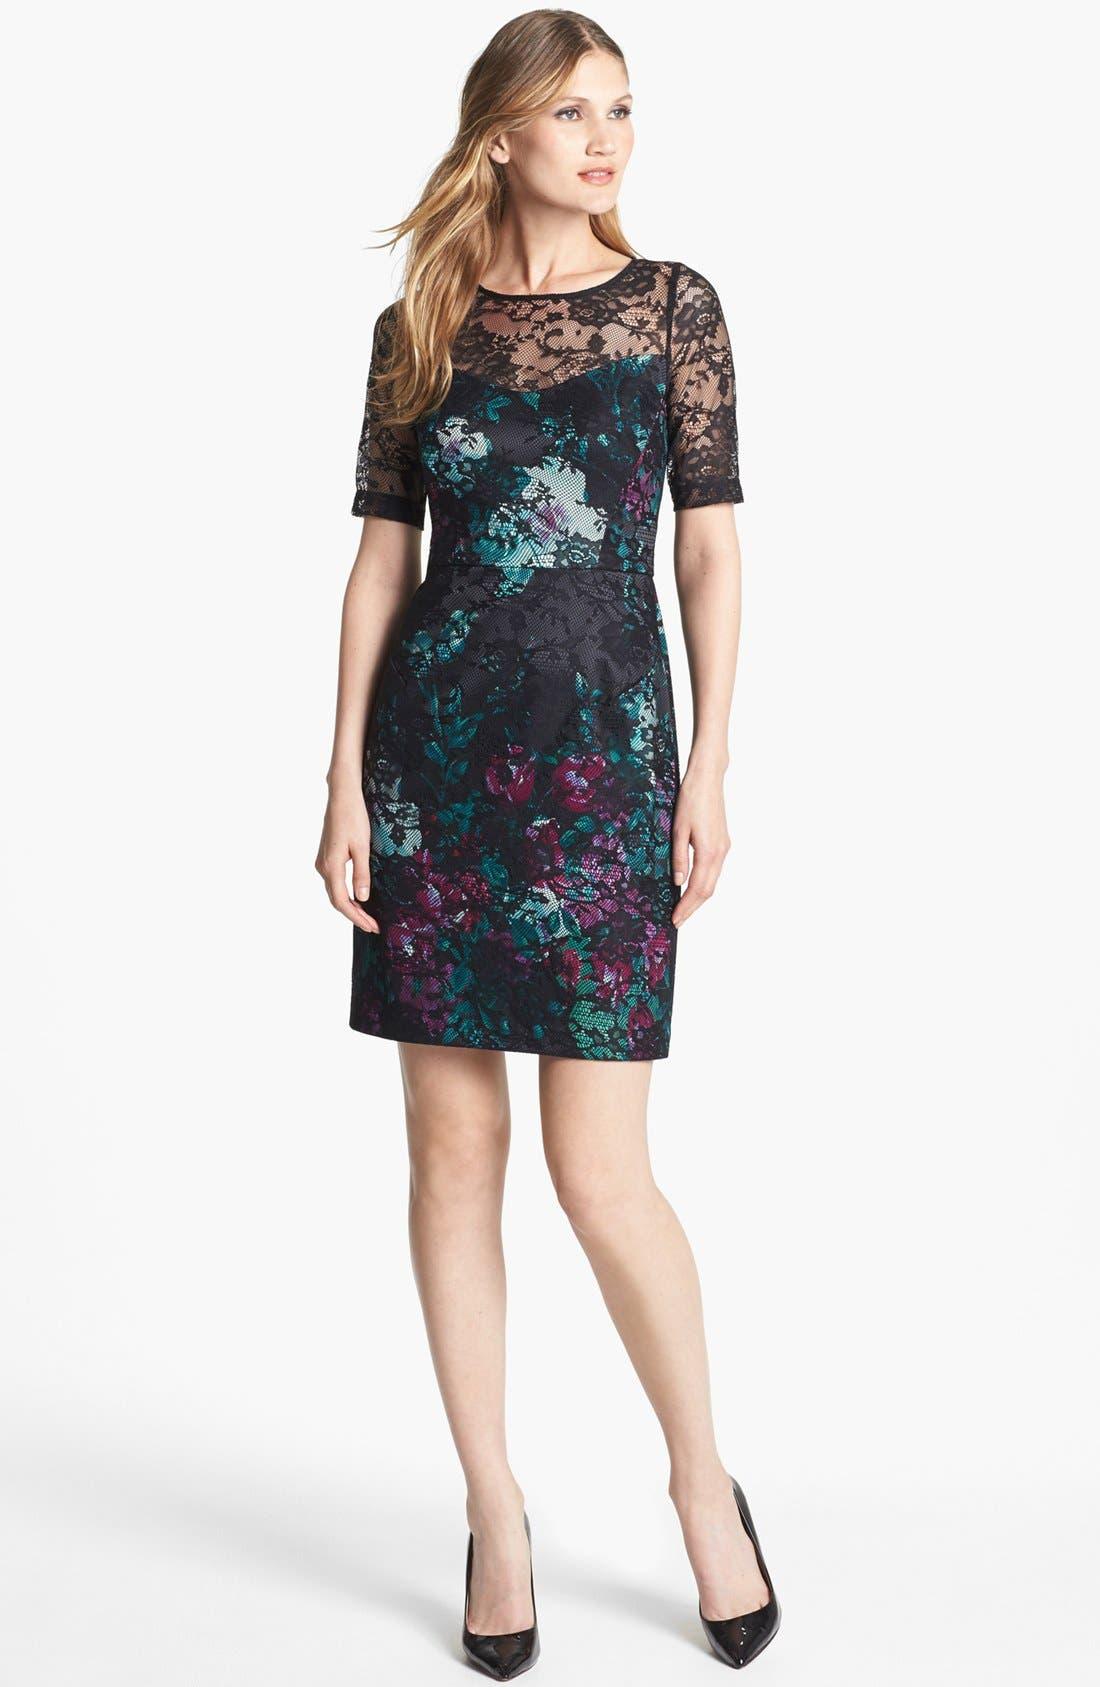 Alternate Image 1 Selected - Donna Ricco Illusion Lace Print Sheath Dress